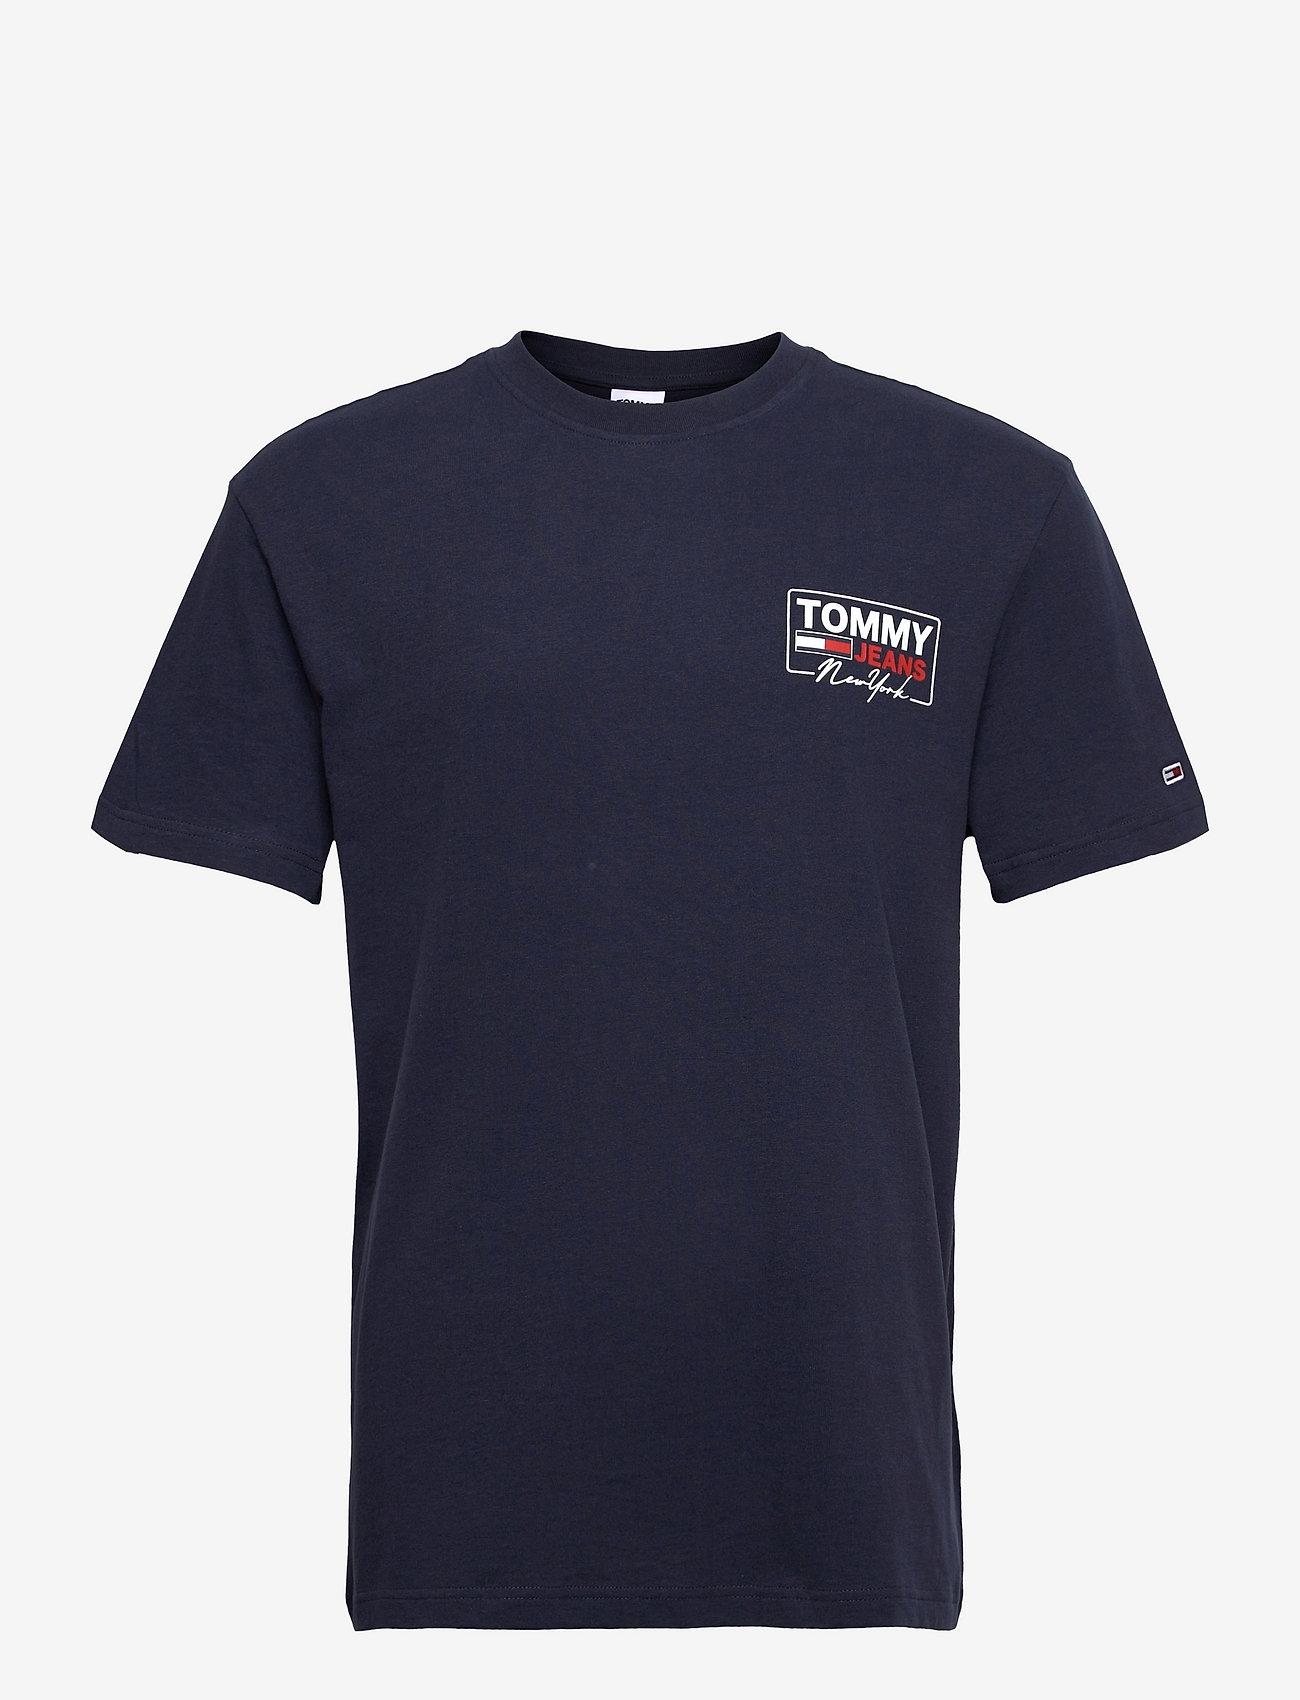 Tommy Jeans - TJM NY SCRIPT BOX BACK LOGO TEE - kortärmade t-shirts - twilight navy - 0